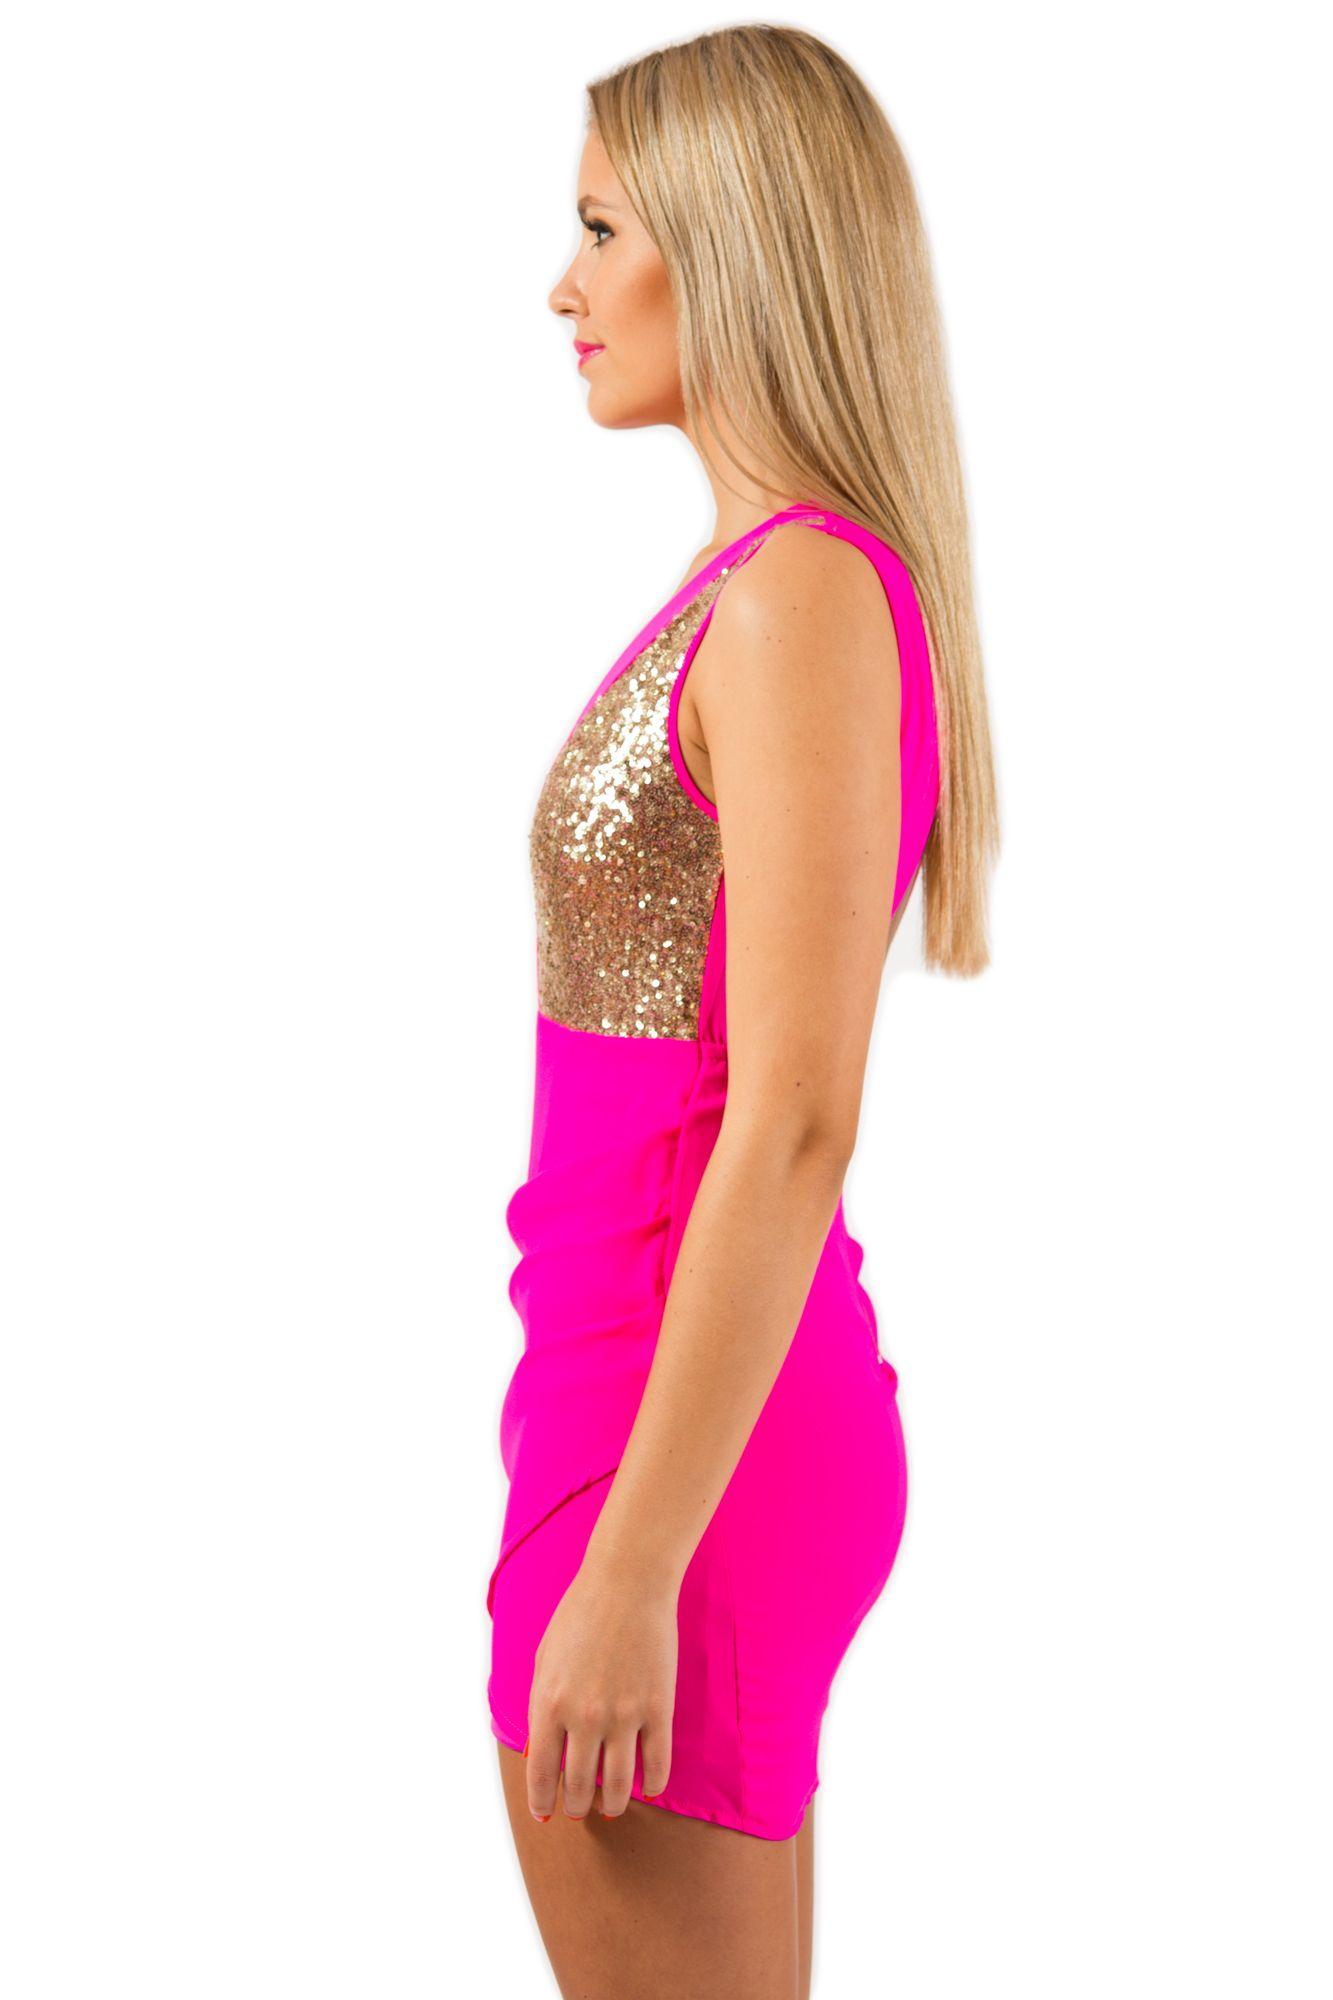 Pink cut out dress  Hot Pink Gold Sequin Sleeveless Back Cut Out Dress Dress clubbing